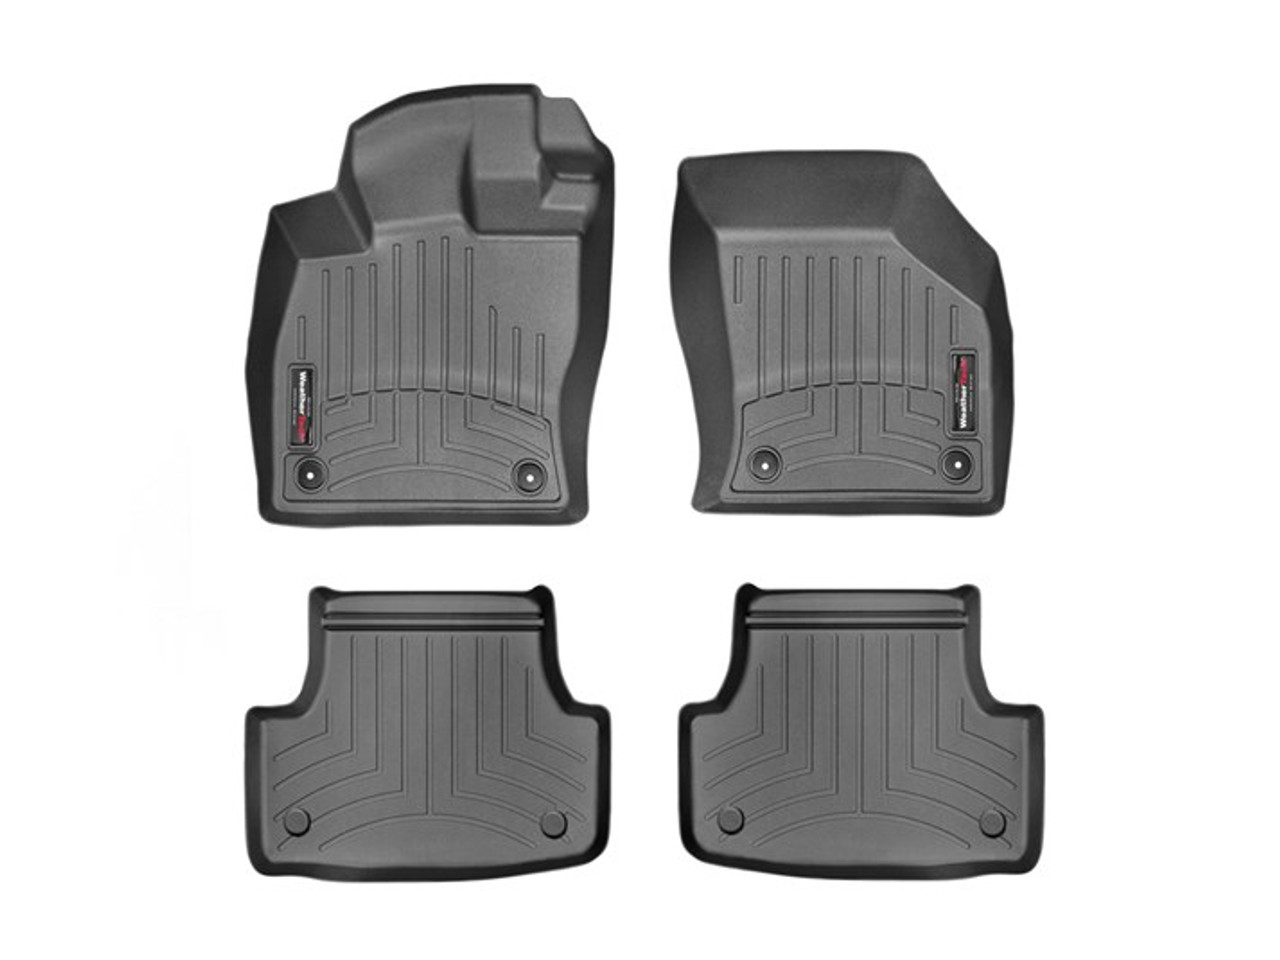 VW GTI WeatherTech FloorLiners - Black